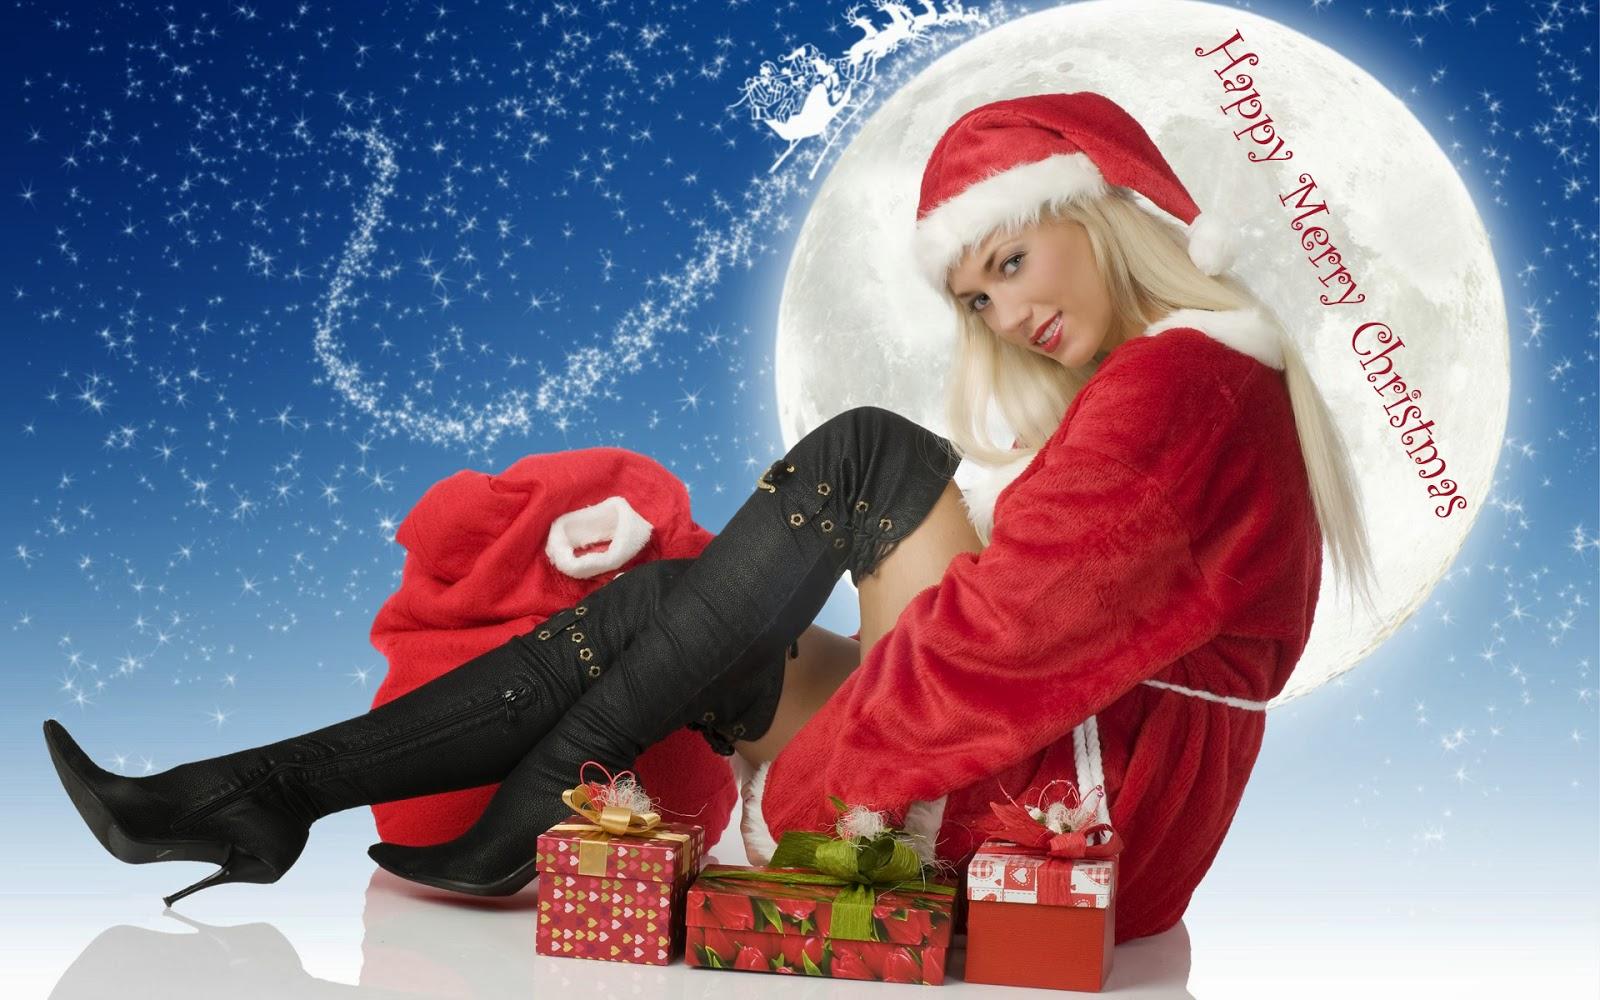 Christmas Santa Claus Girls Wallpapers